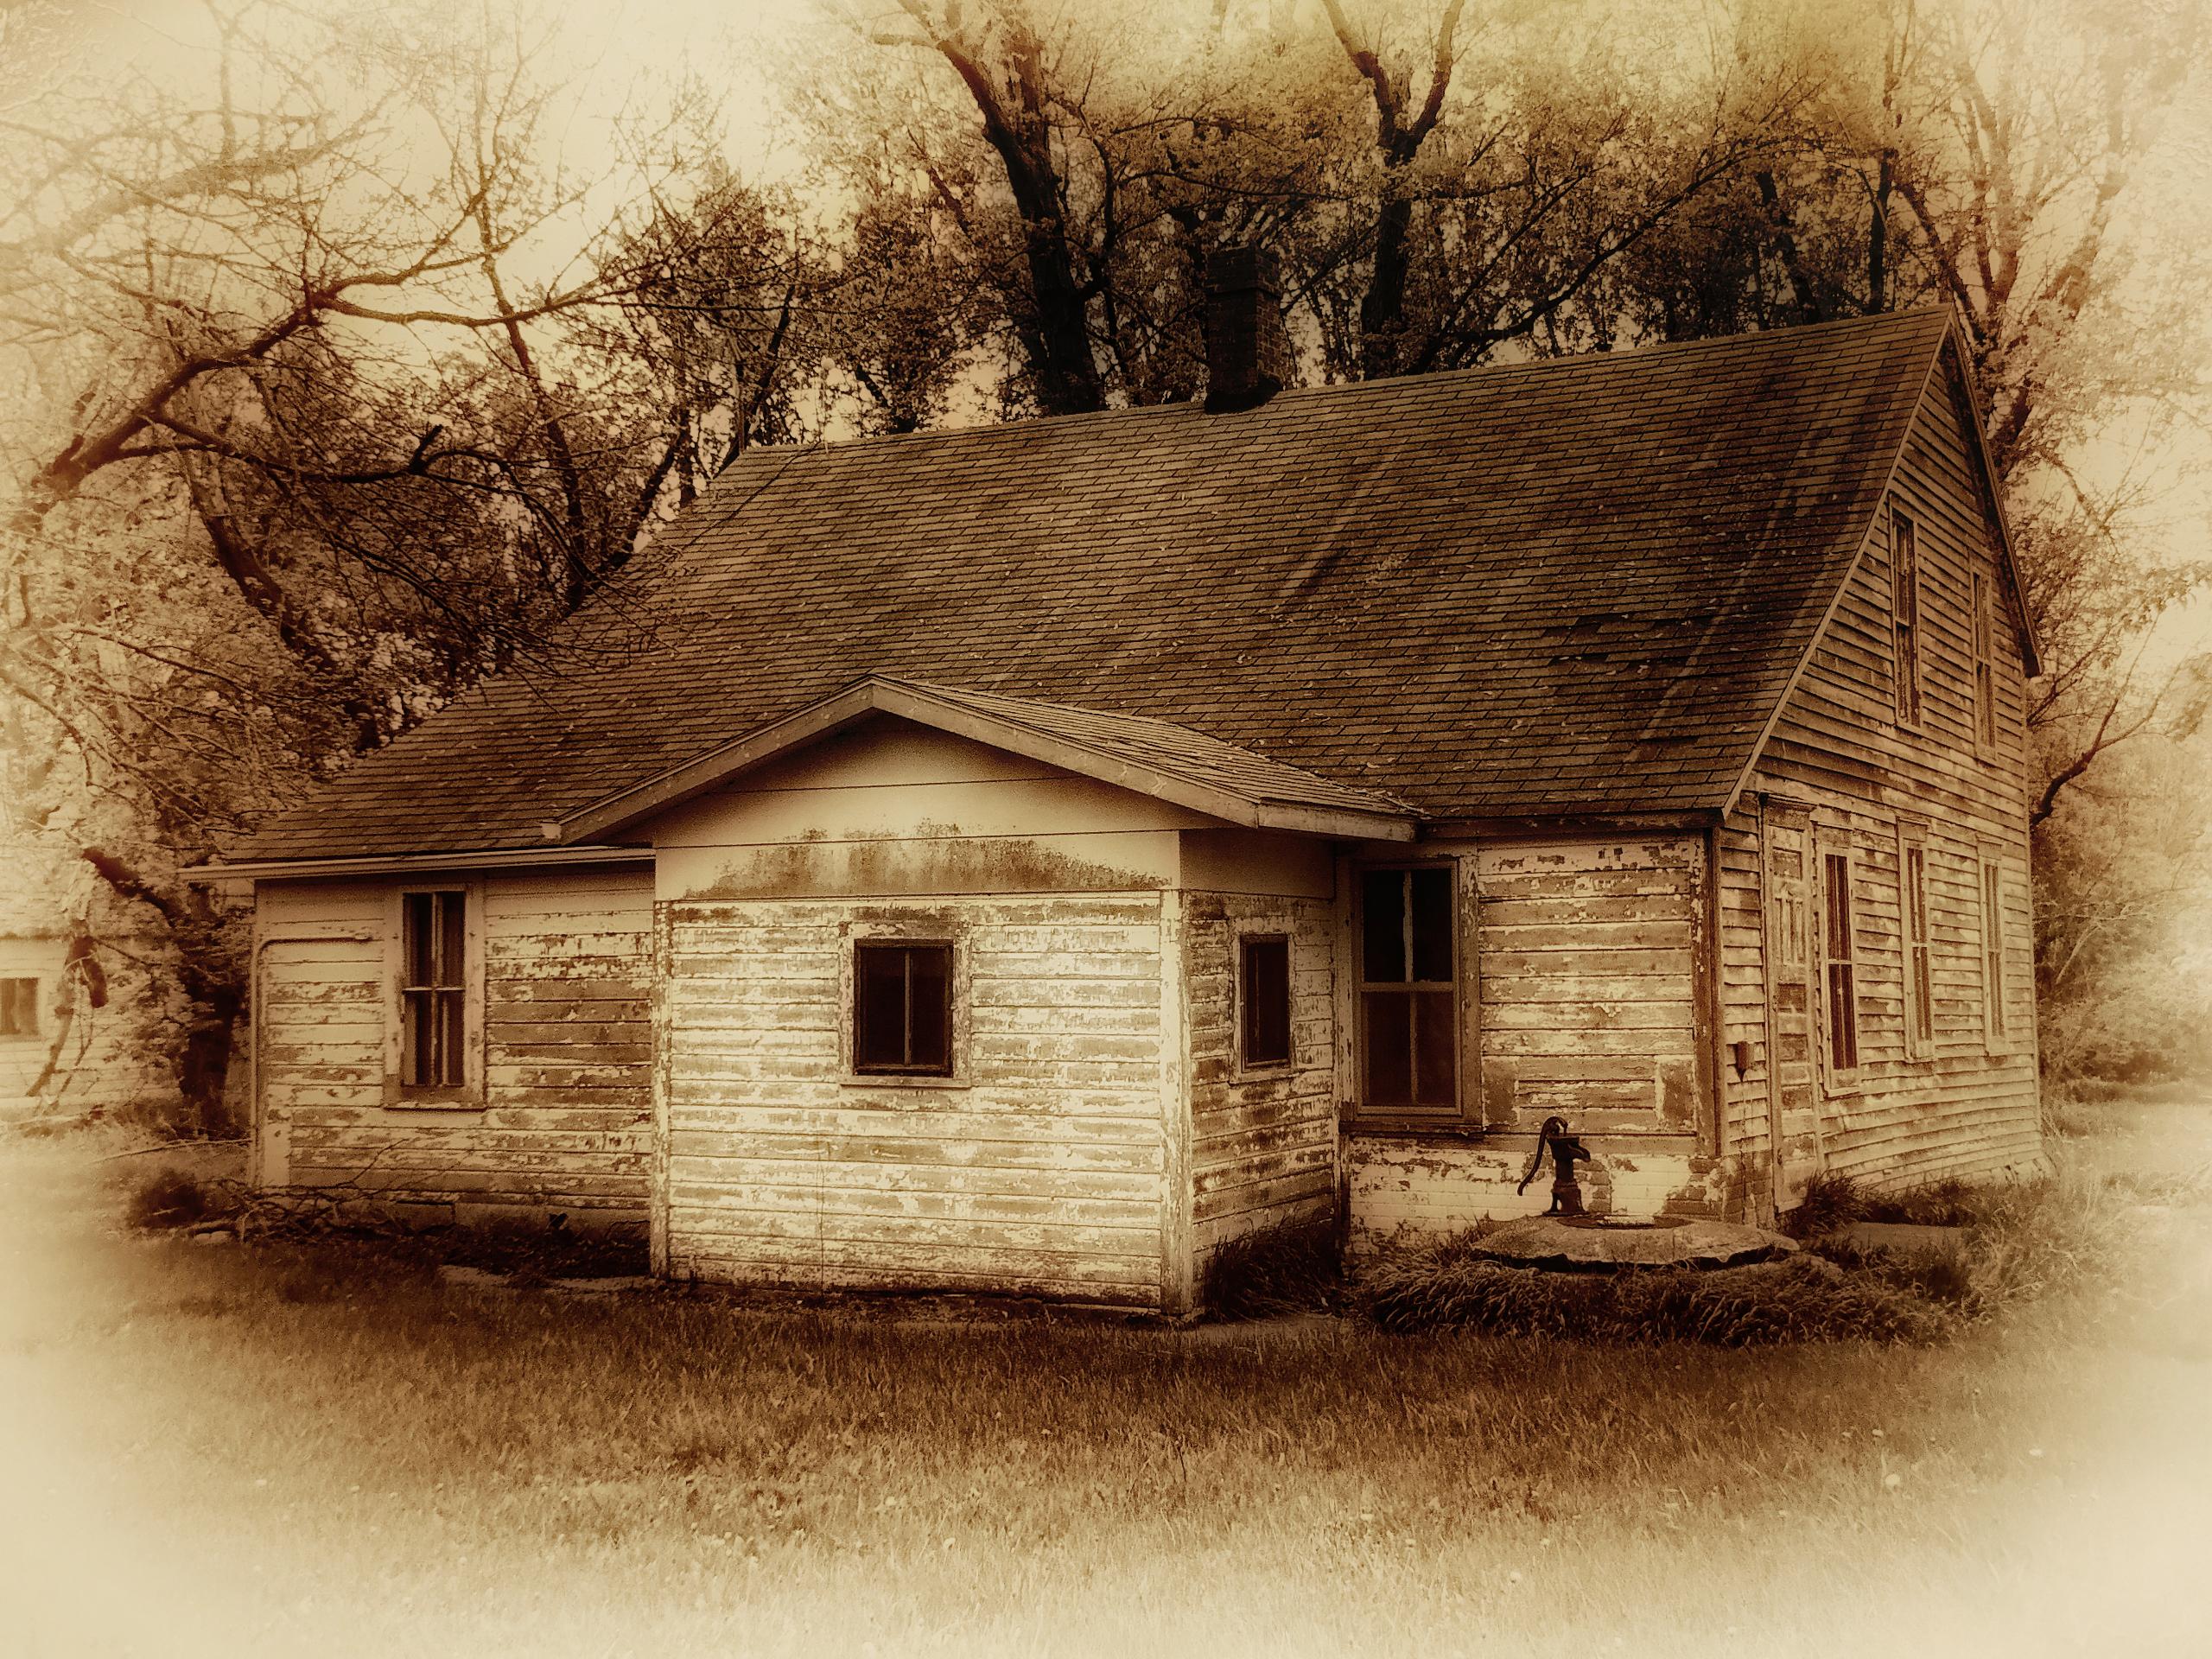 Drawing Abandoned Wood House Sepia Farm Texture USA Barn Hut Cottage Minnesota Rural Shack Country Blinkagain